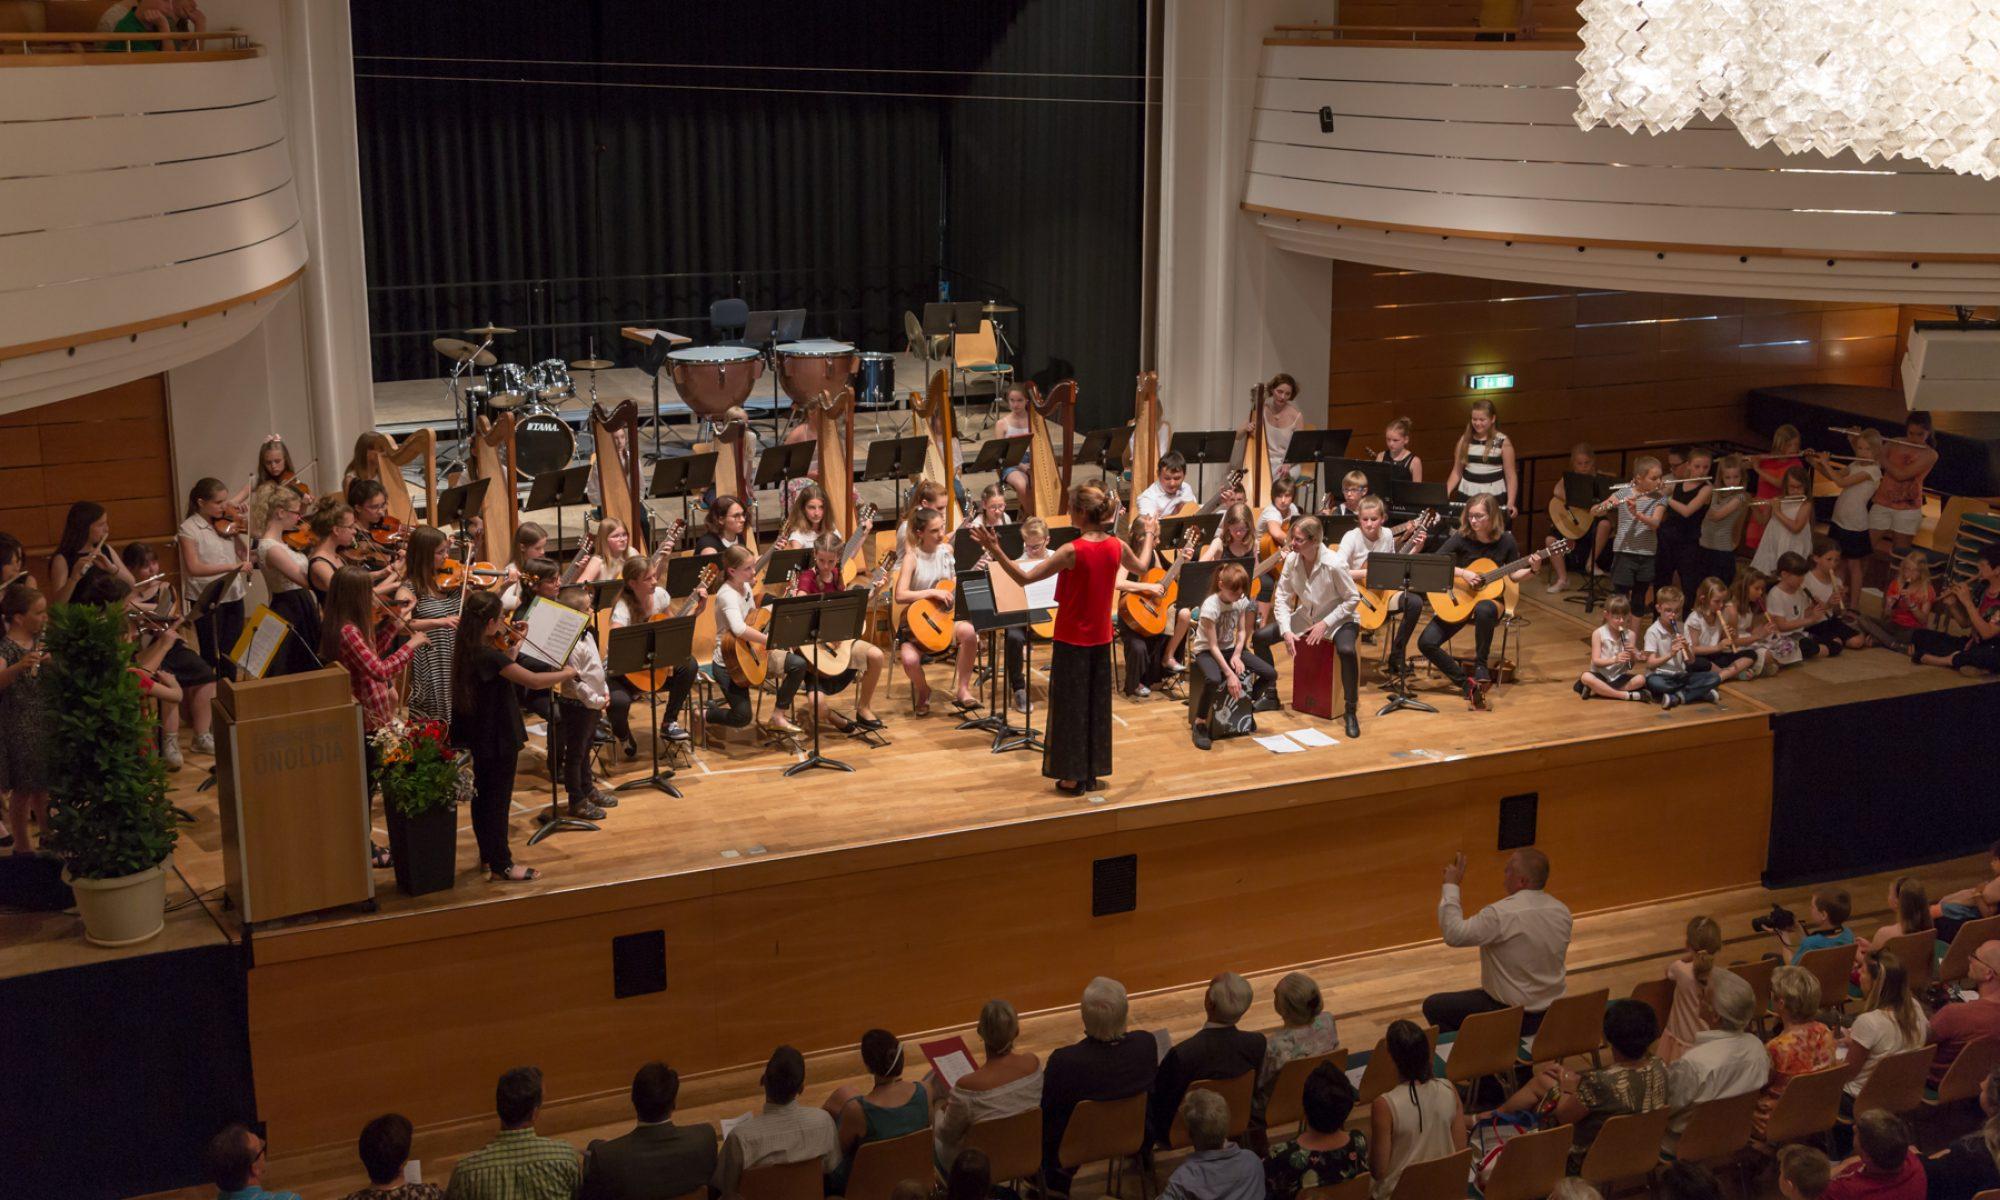 Städt. Musikschule Ansbach